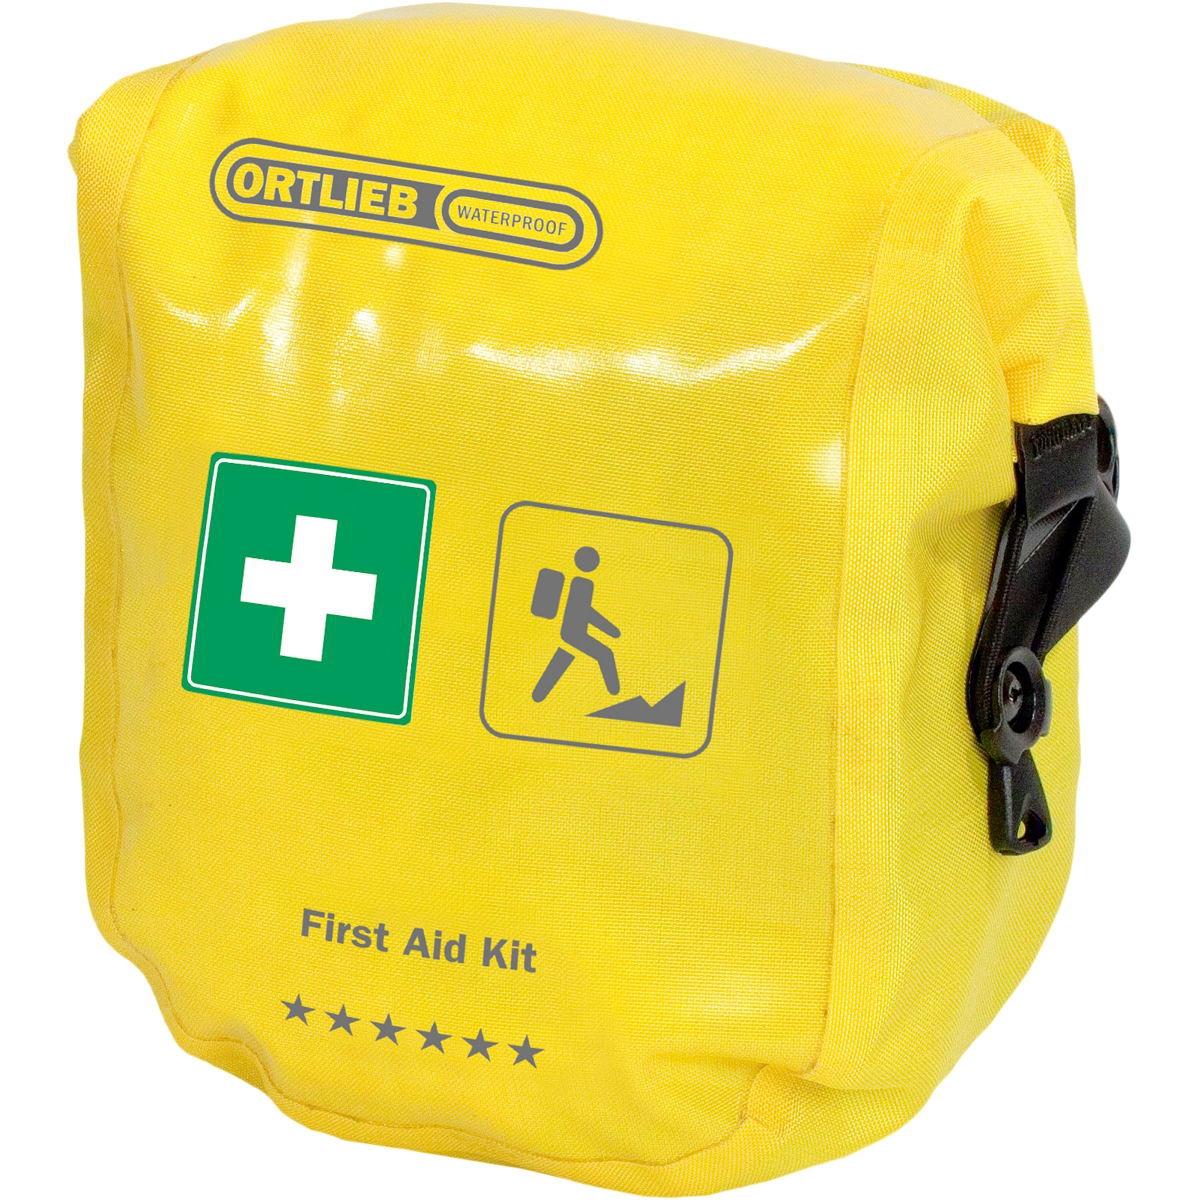 Ortlieb First Aid Kit, Trekking Ultra High